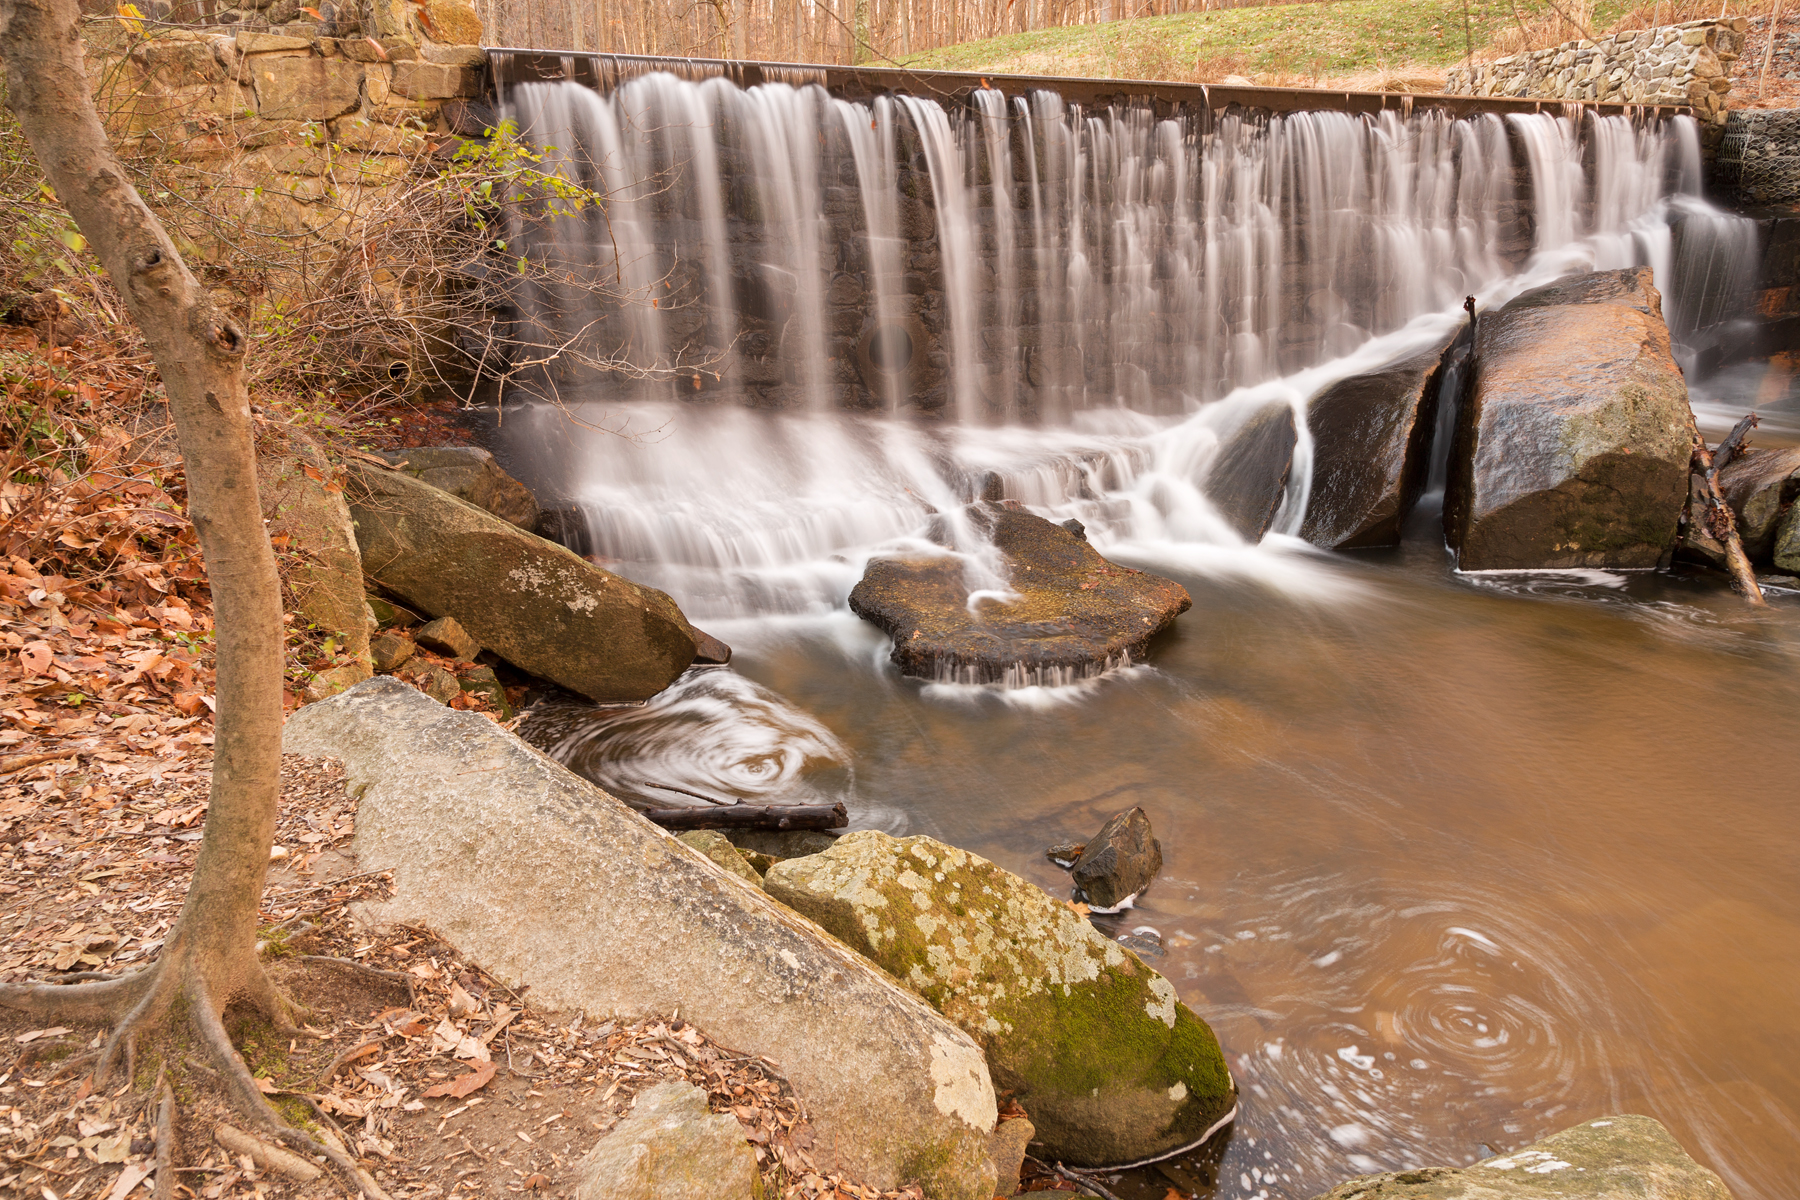 Rock Run Falls, , Shades, Scenery, Scenic, HQ Photo